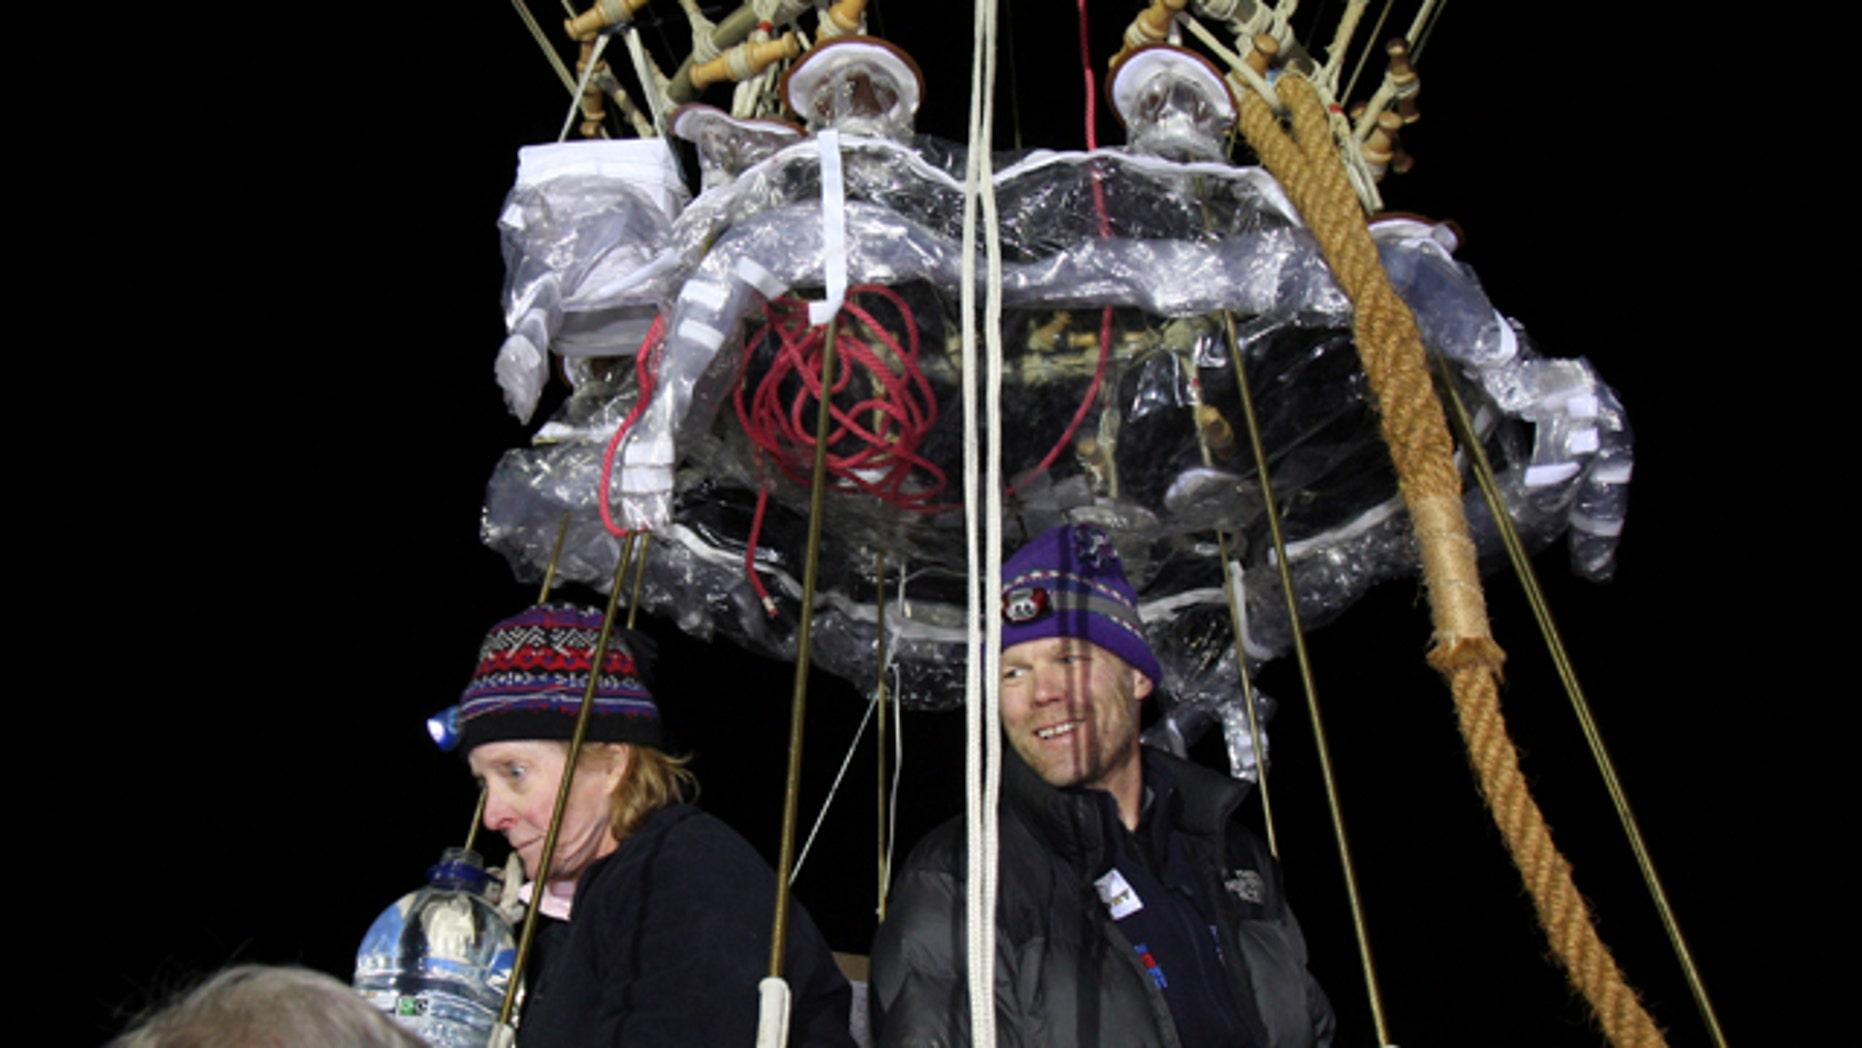 Sept. 25: Balloonists Carol Rymer Davis and Richard Abruzzo launch for the Gordon Bennett gas balloon race at Bristol, England.